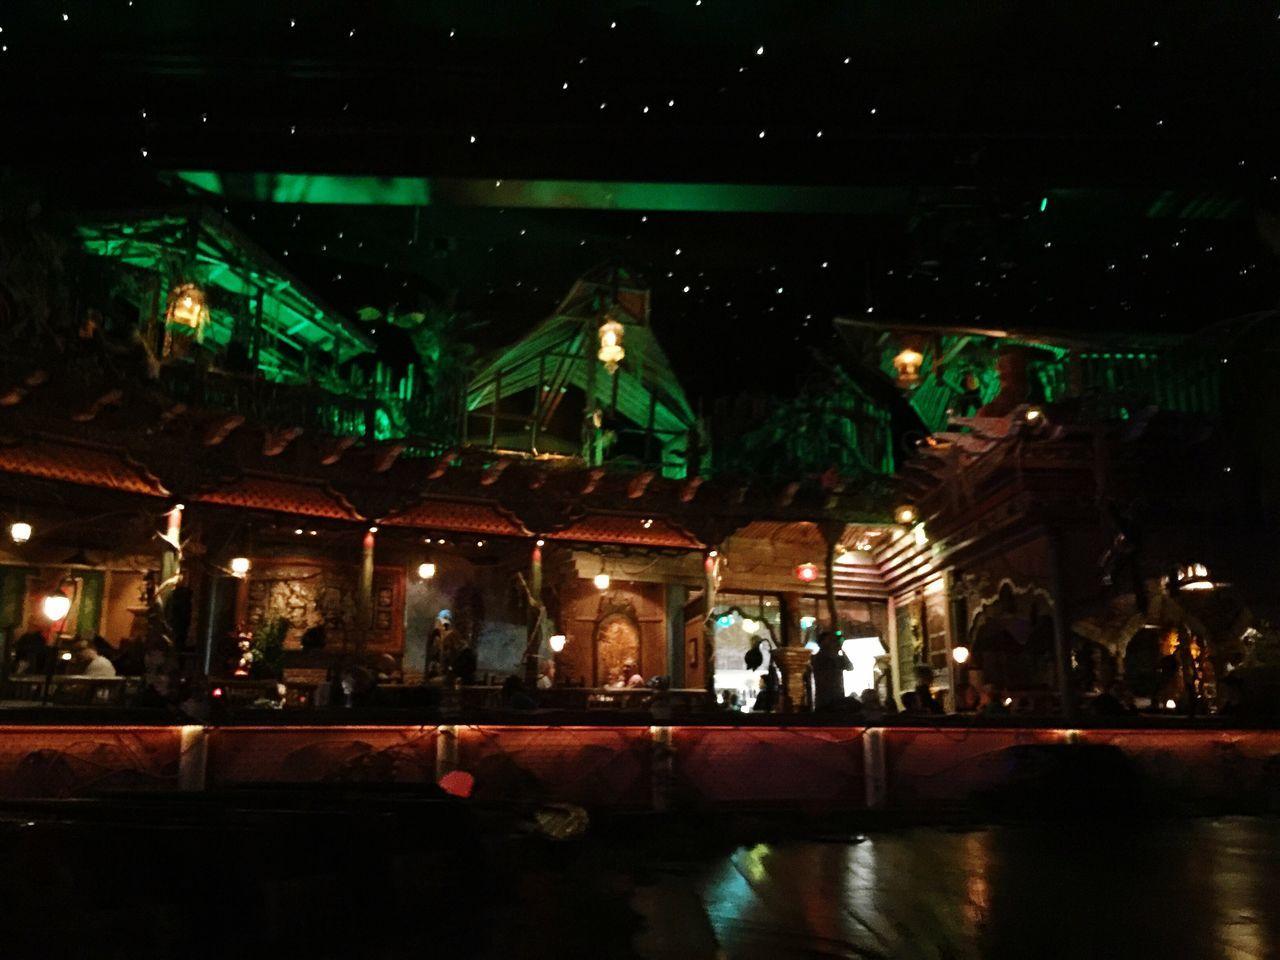 Thai Food Thai Restaurant Nightphotography Water Reflections Lights Light And Shadow